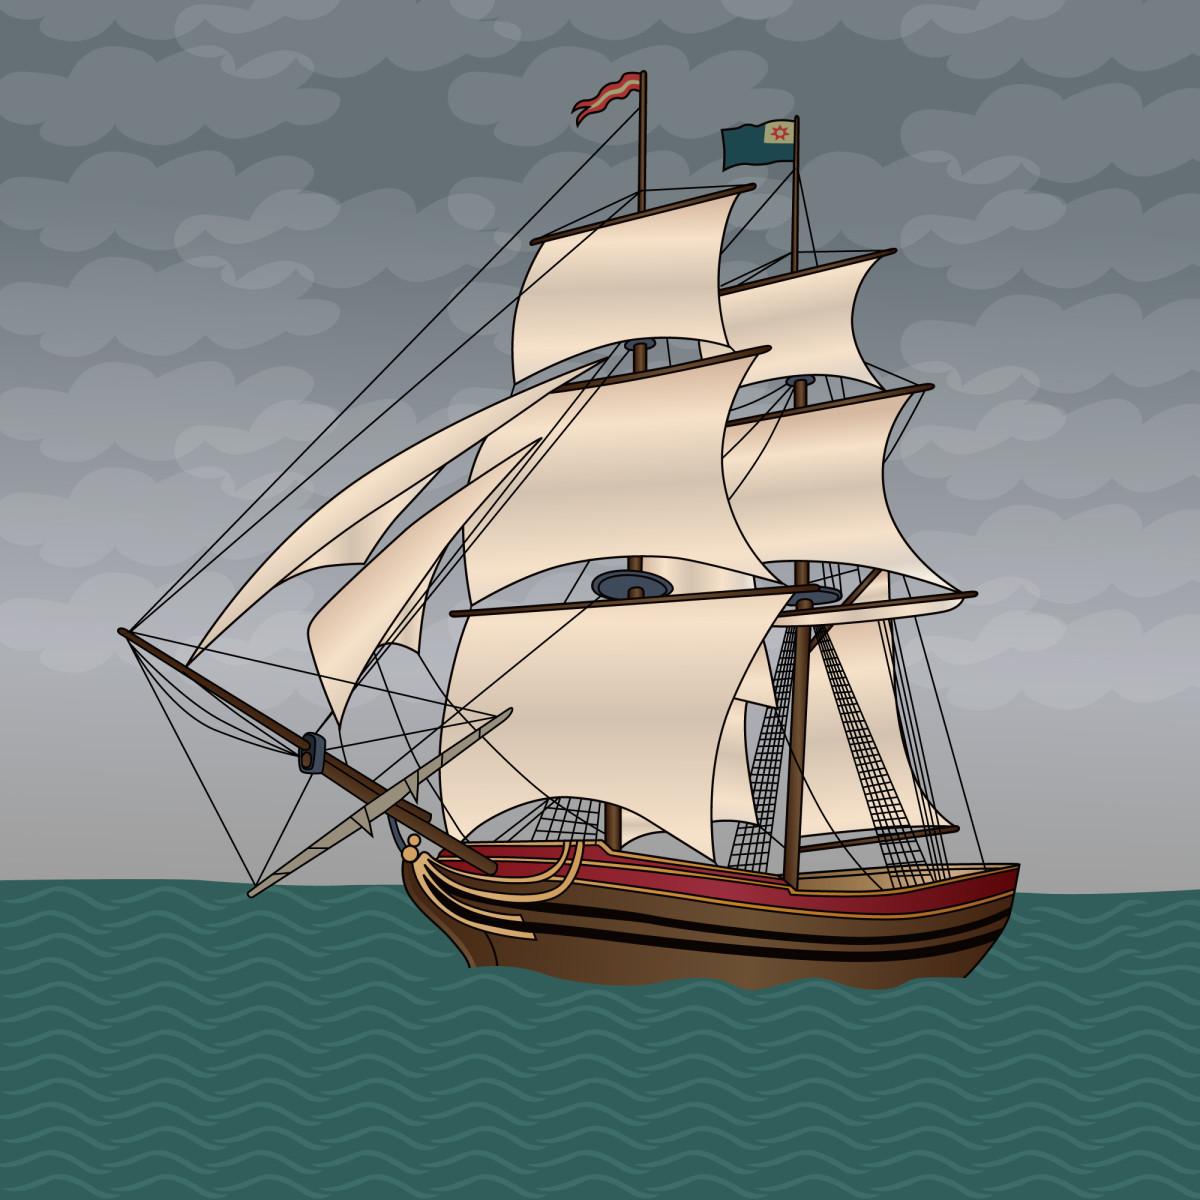 El Cazador—How a Shipwreck Changed America's Landscape